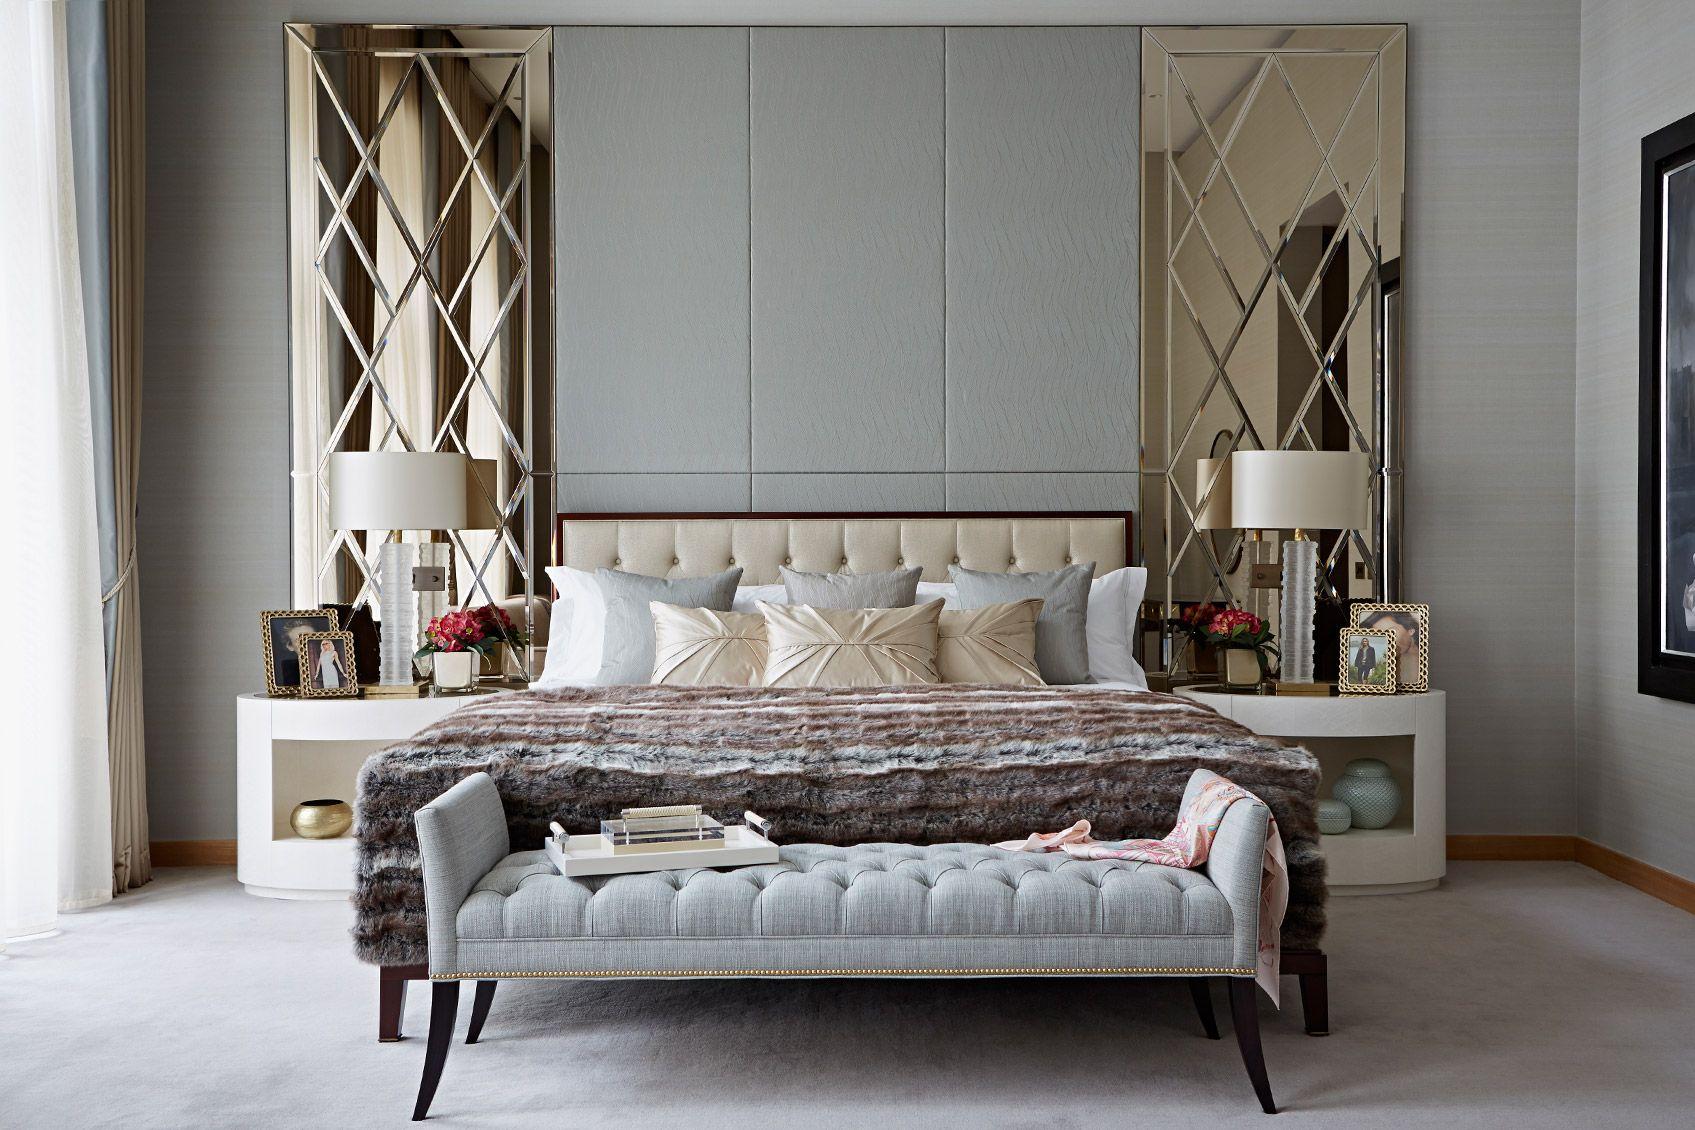 Top Interior Designers Taylor Howes – One Kensington Gardens ...